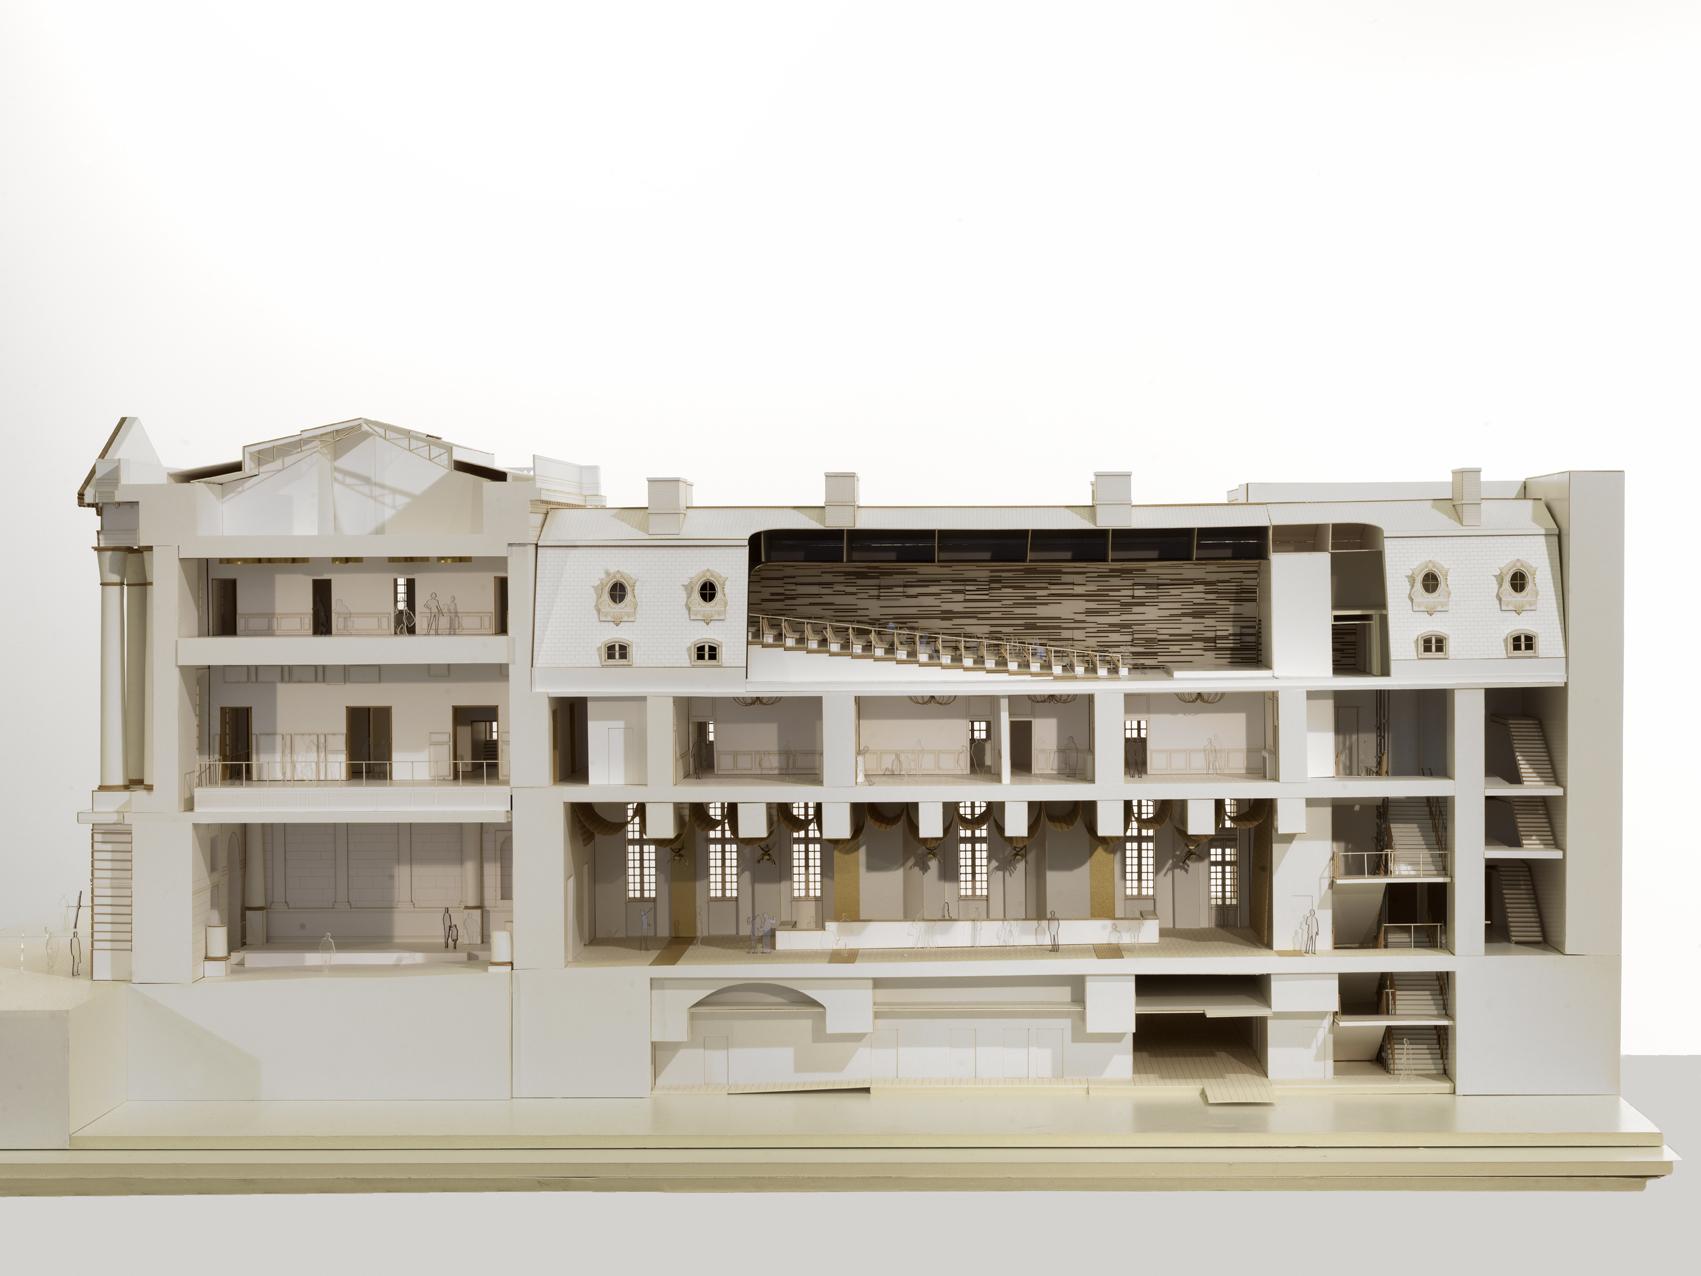 galeria de reforma do pavilh o dufour ch teau de versailles dominique perrault architecte 20. Black Bedroom Furniture Sets. Home Design Ideas